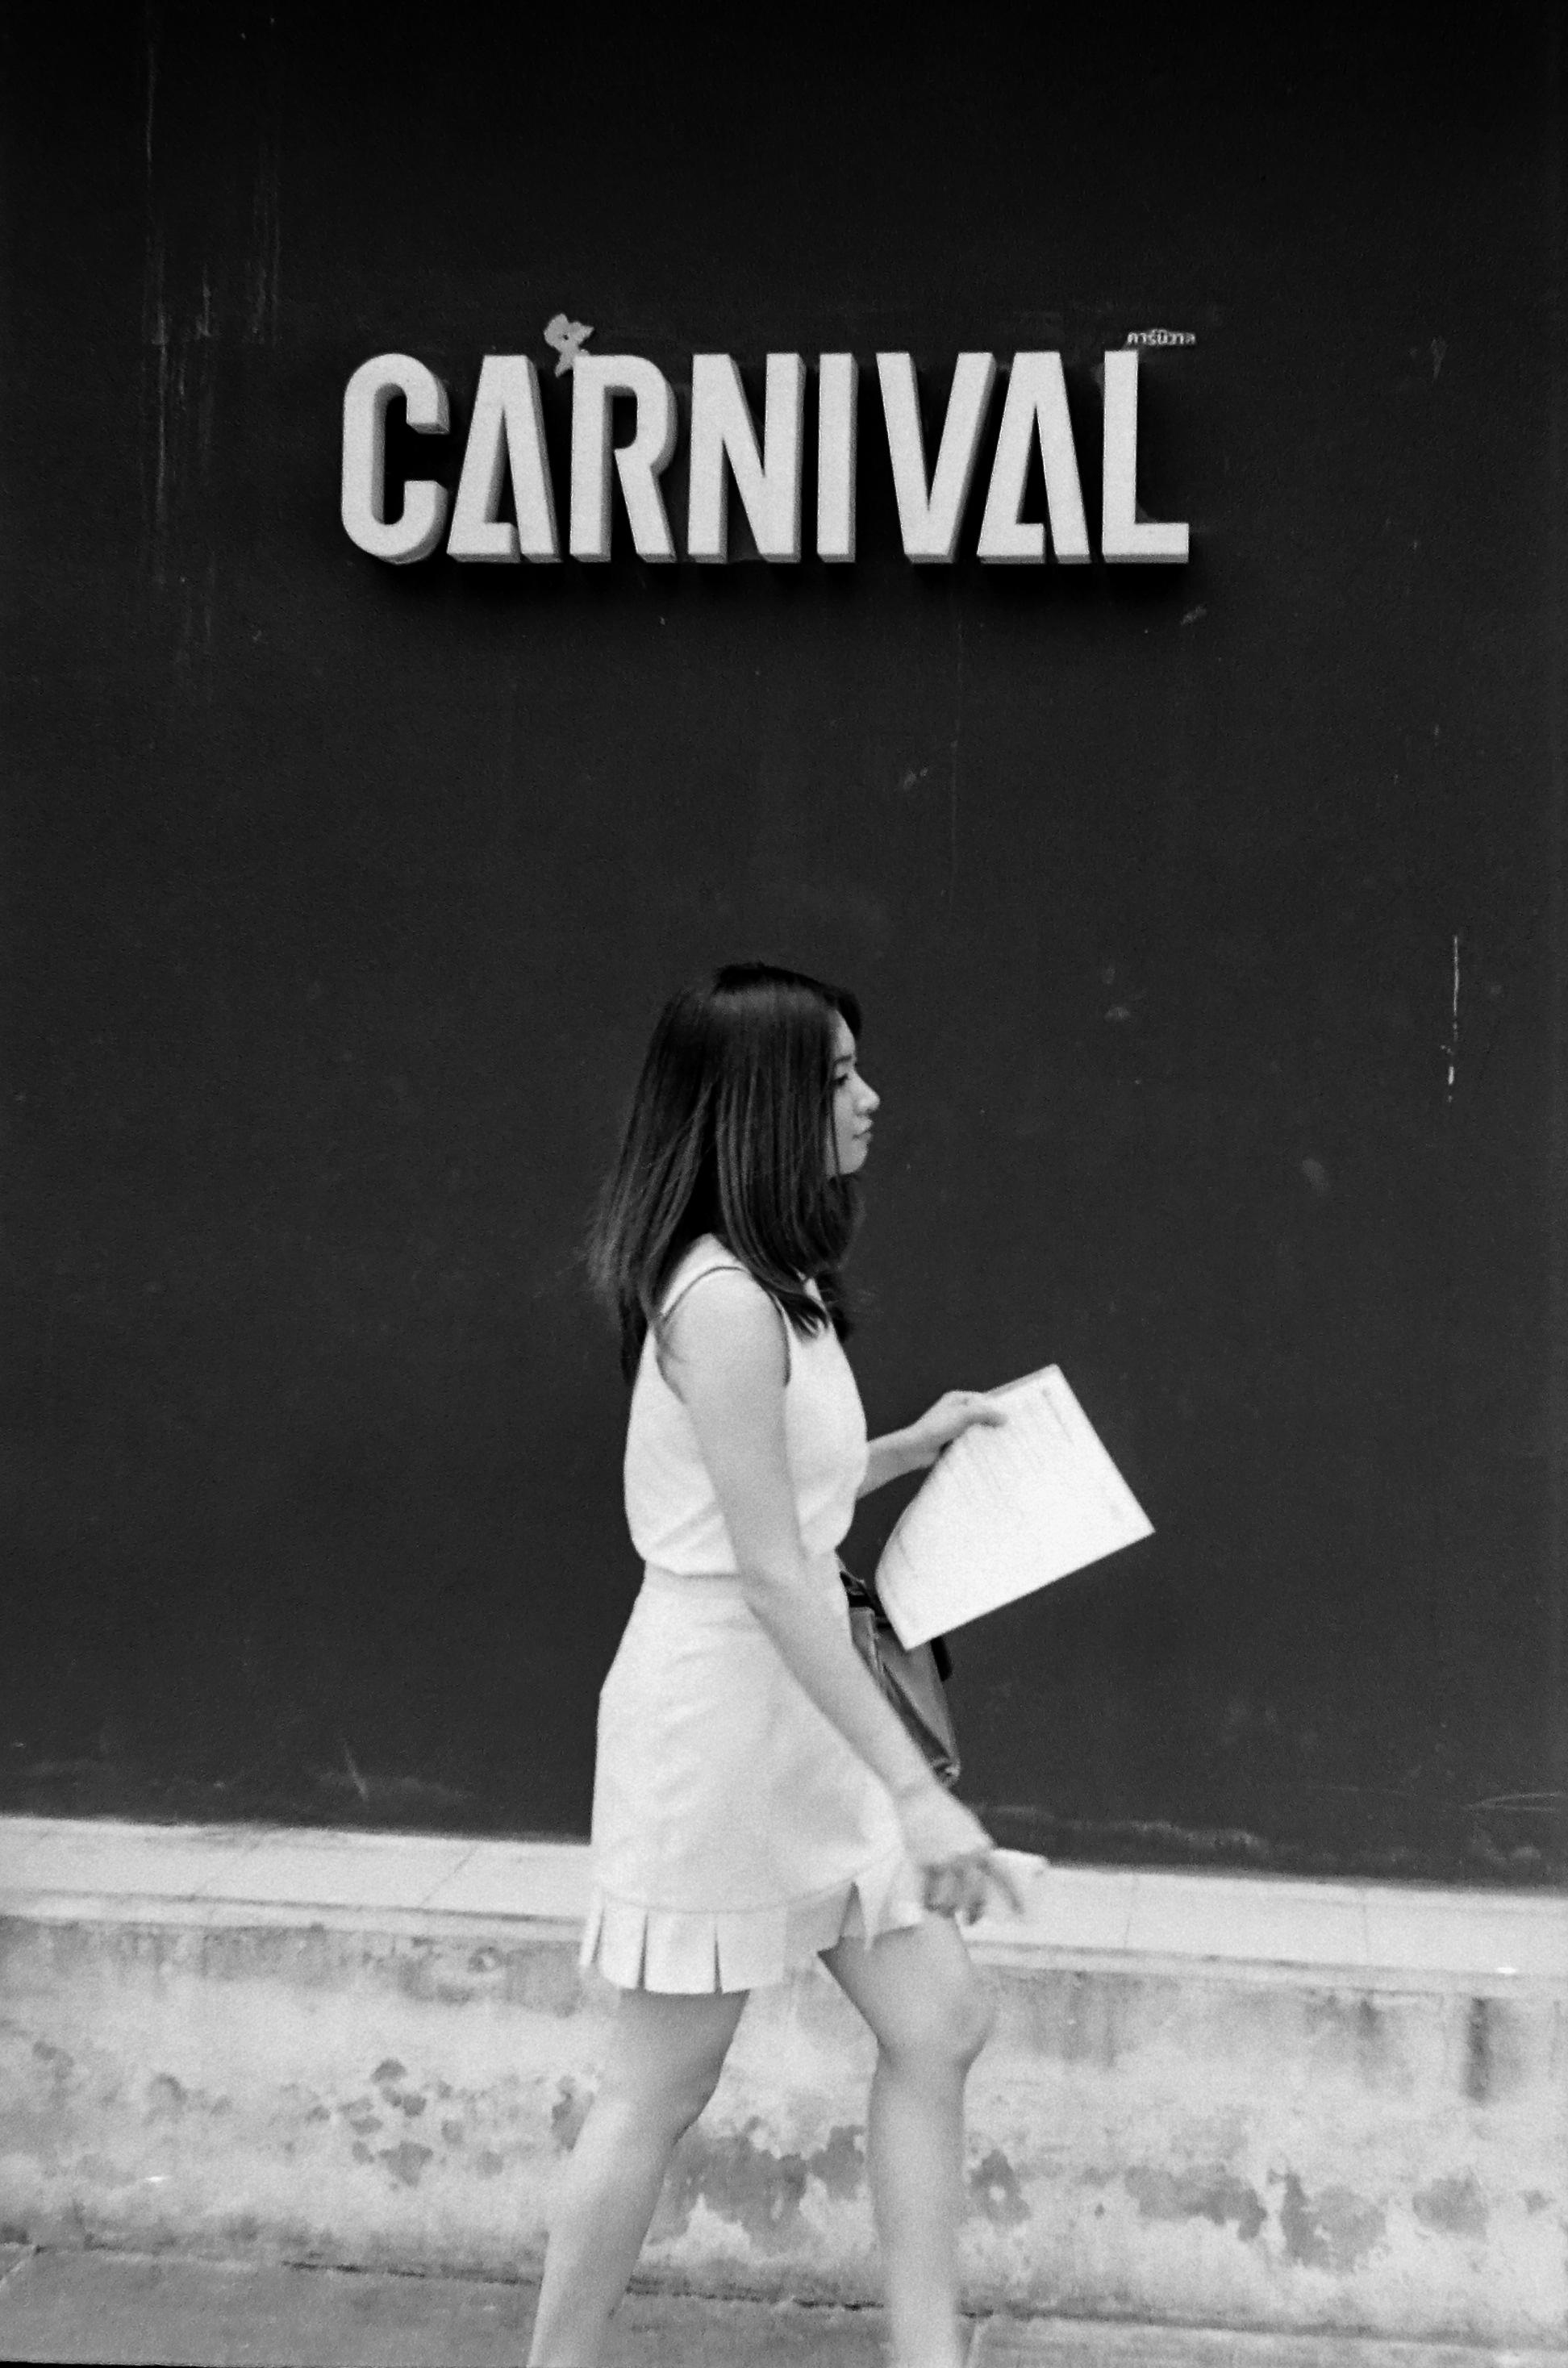 chromacomaphoto street photography bangkok thailand film tri x summicron rigid 50 leica m4 black and white (15).JPG